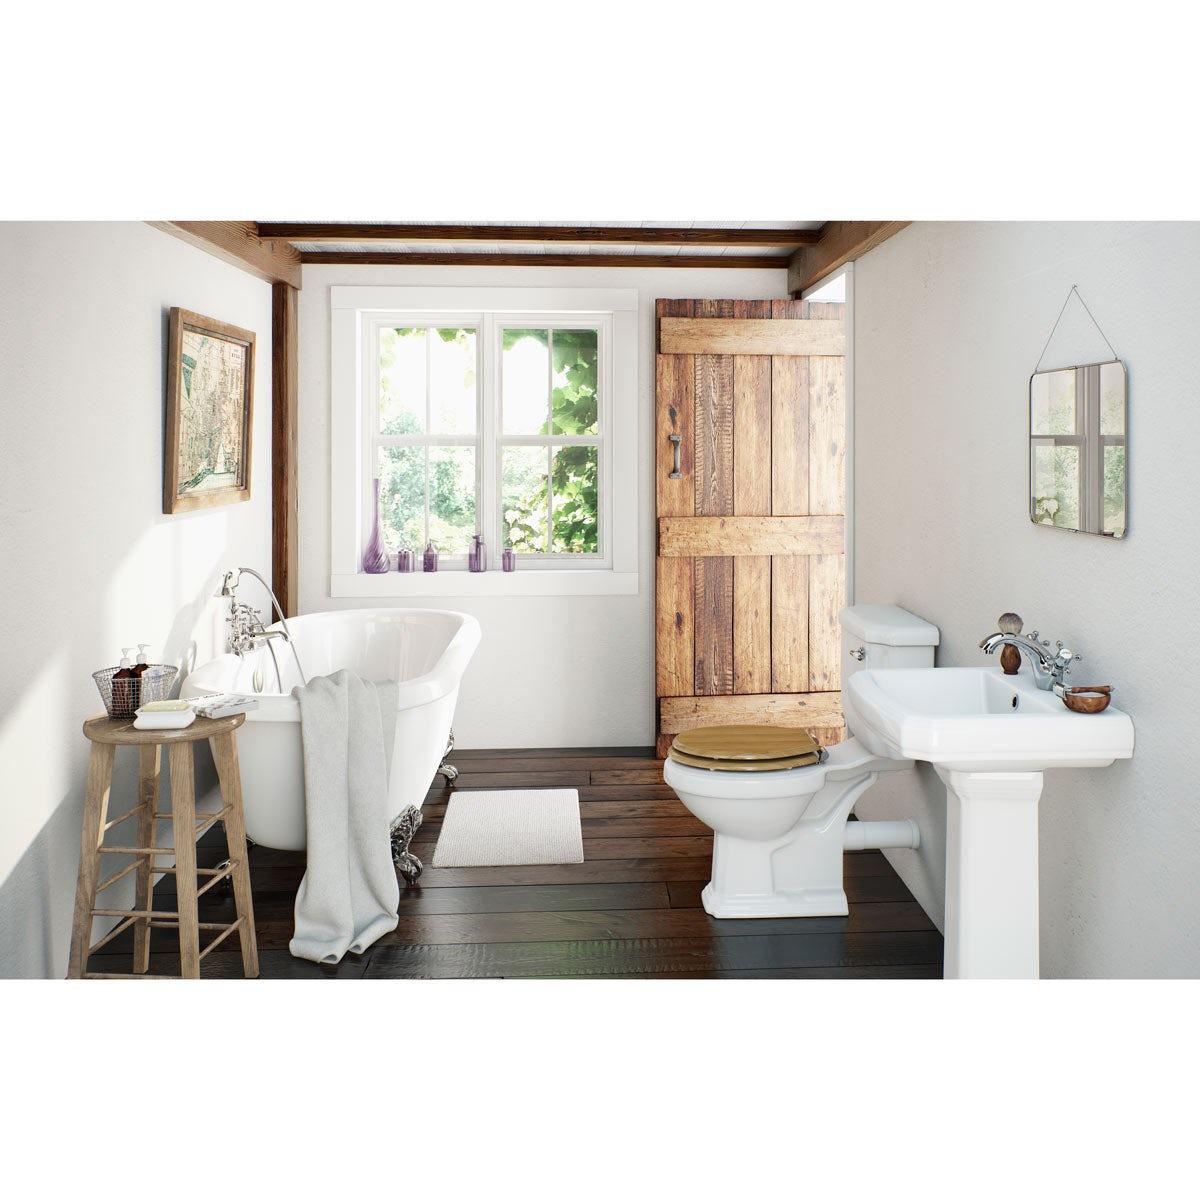 cavendish oak bathroom suite with roll top bath large victoriaplum